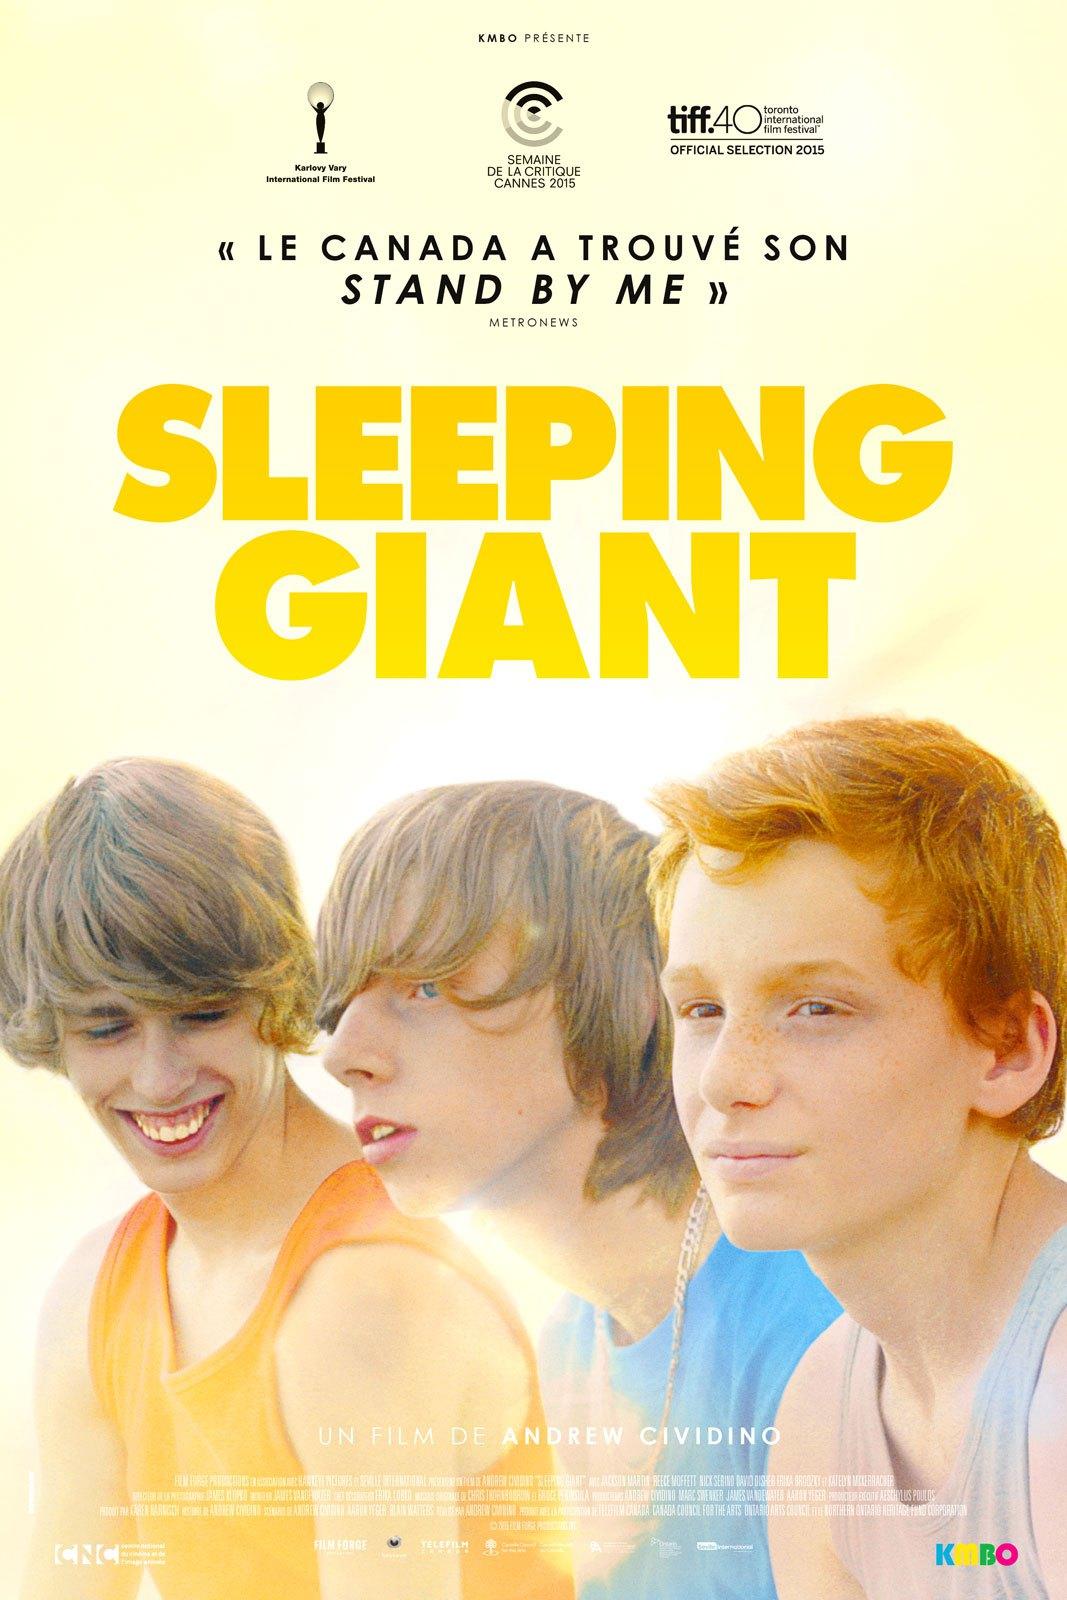 [CRITIQUE] SLEEPING GIANT